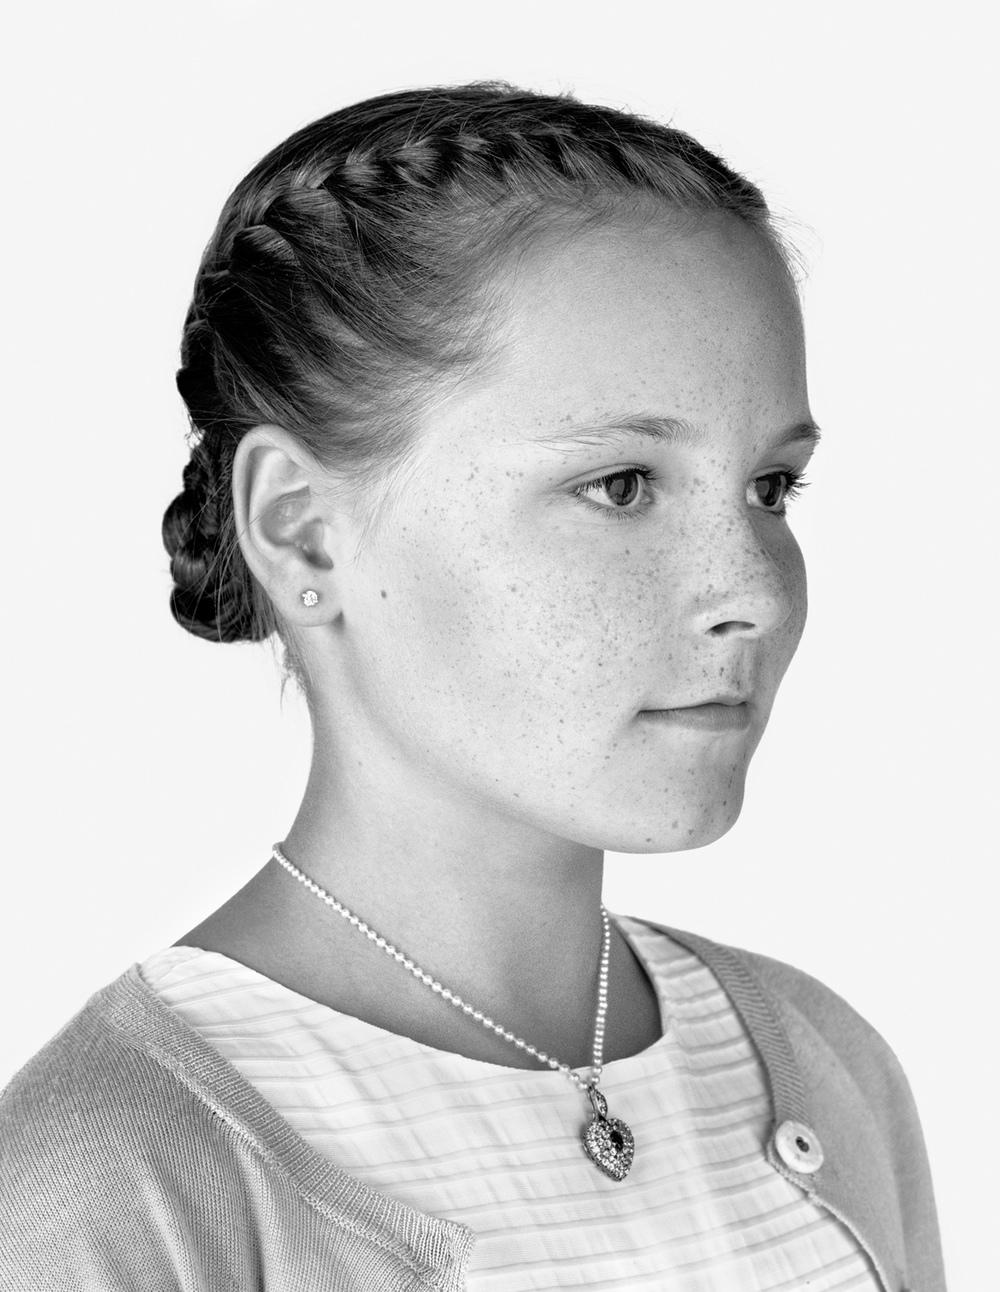 Her Royal Highness The Princess Ingrid Alexandra